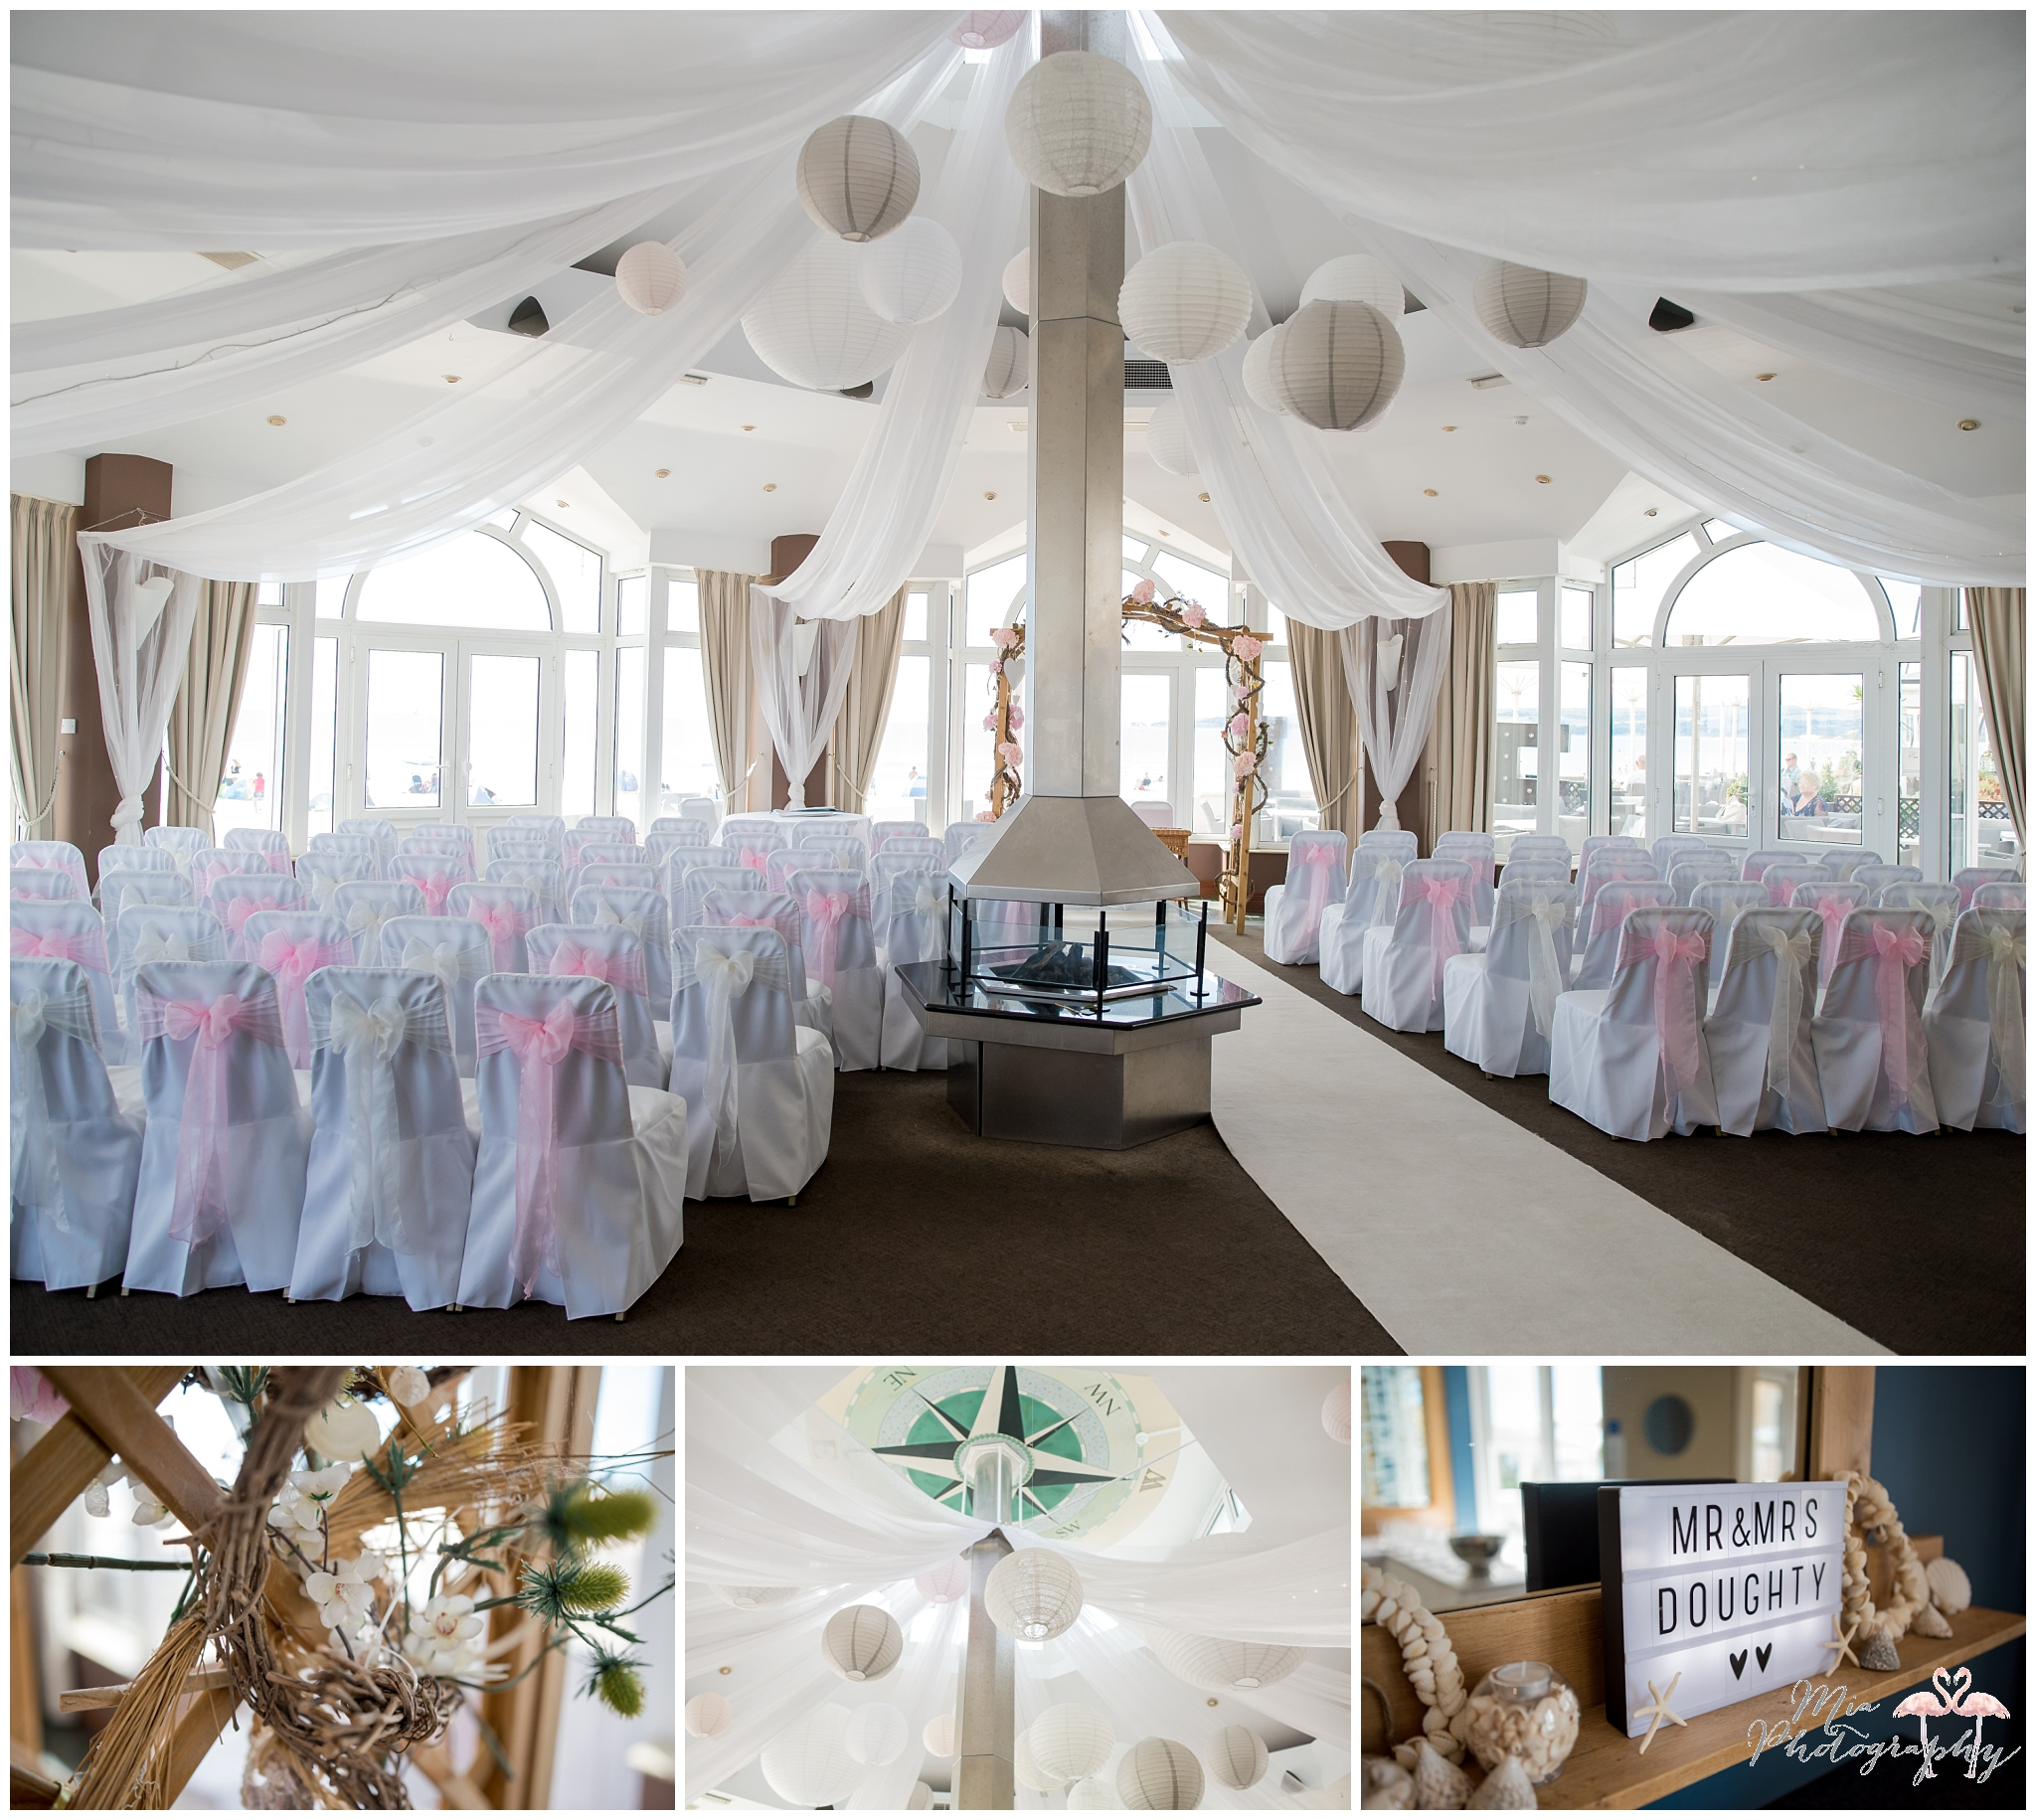 The Sandbanks Hotel wedding photography